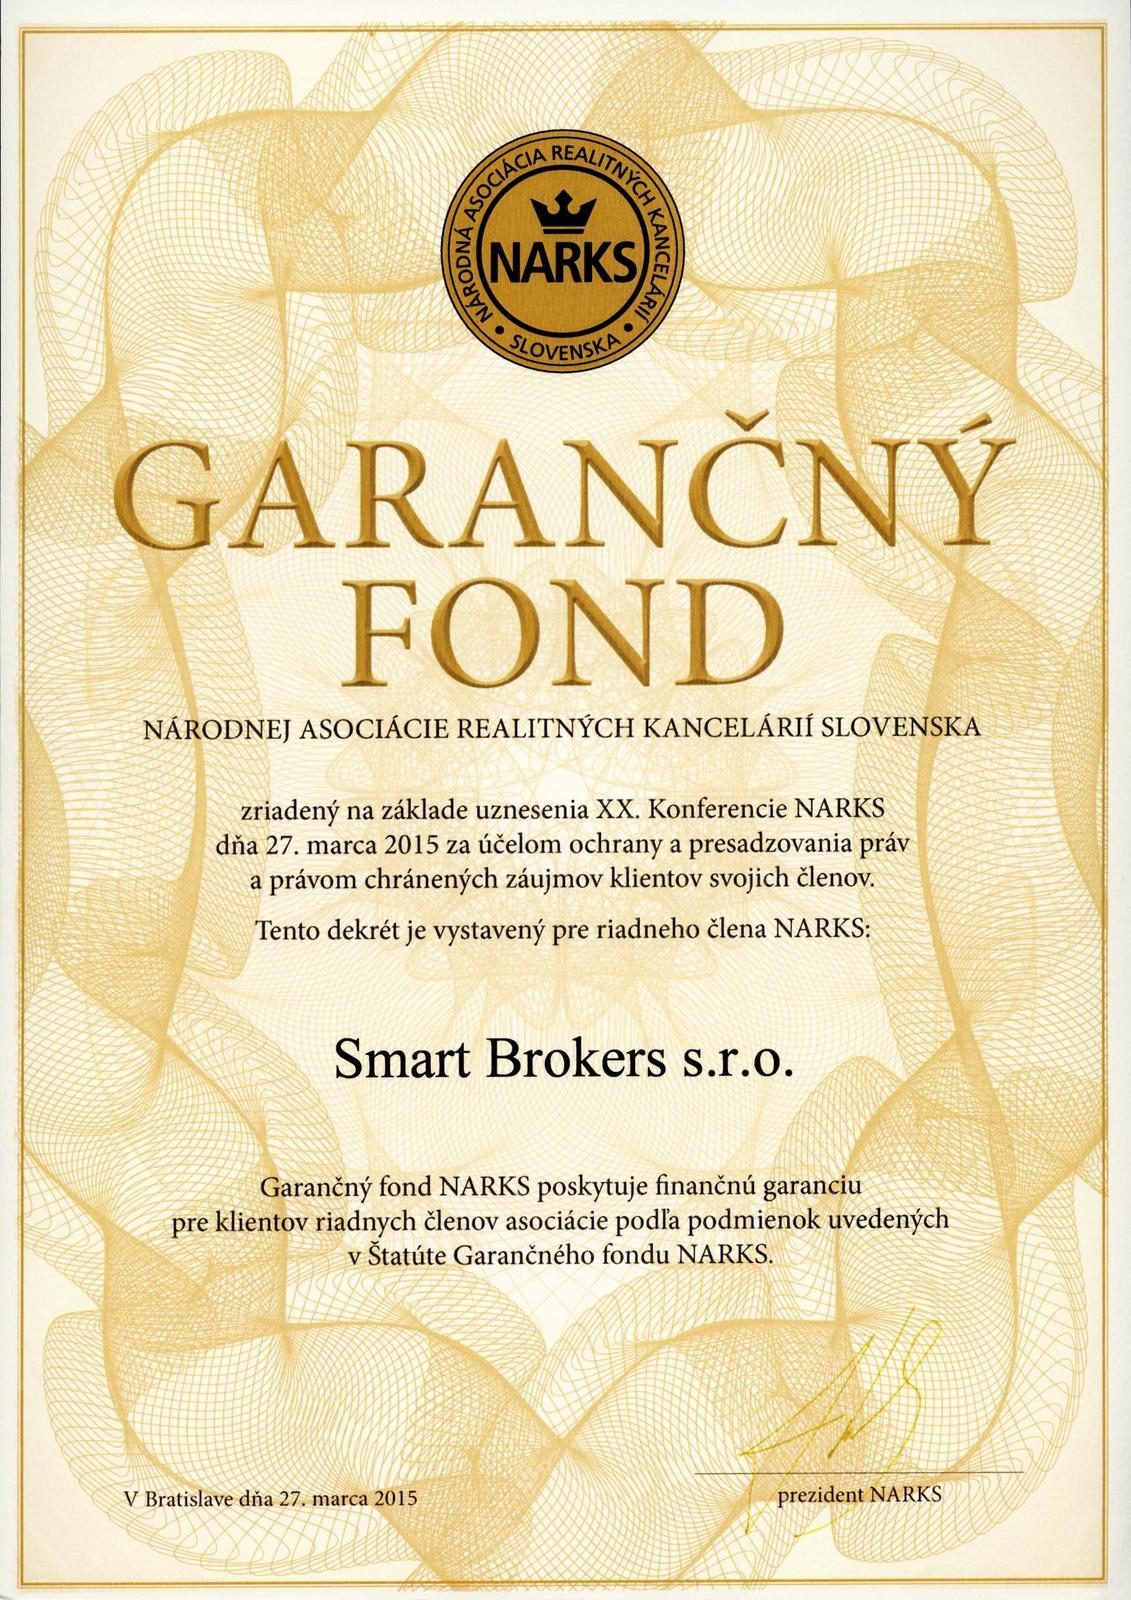 smartbrokers - Garančný fond NARKS / Smart Brokers s.r.o.